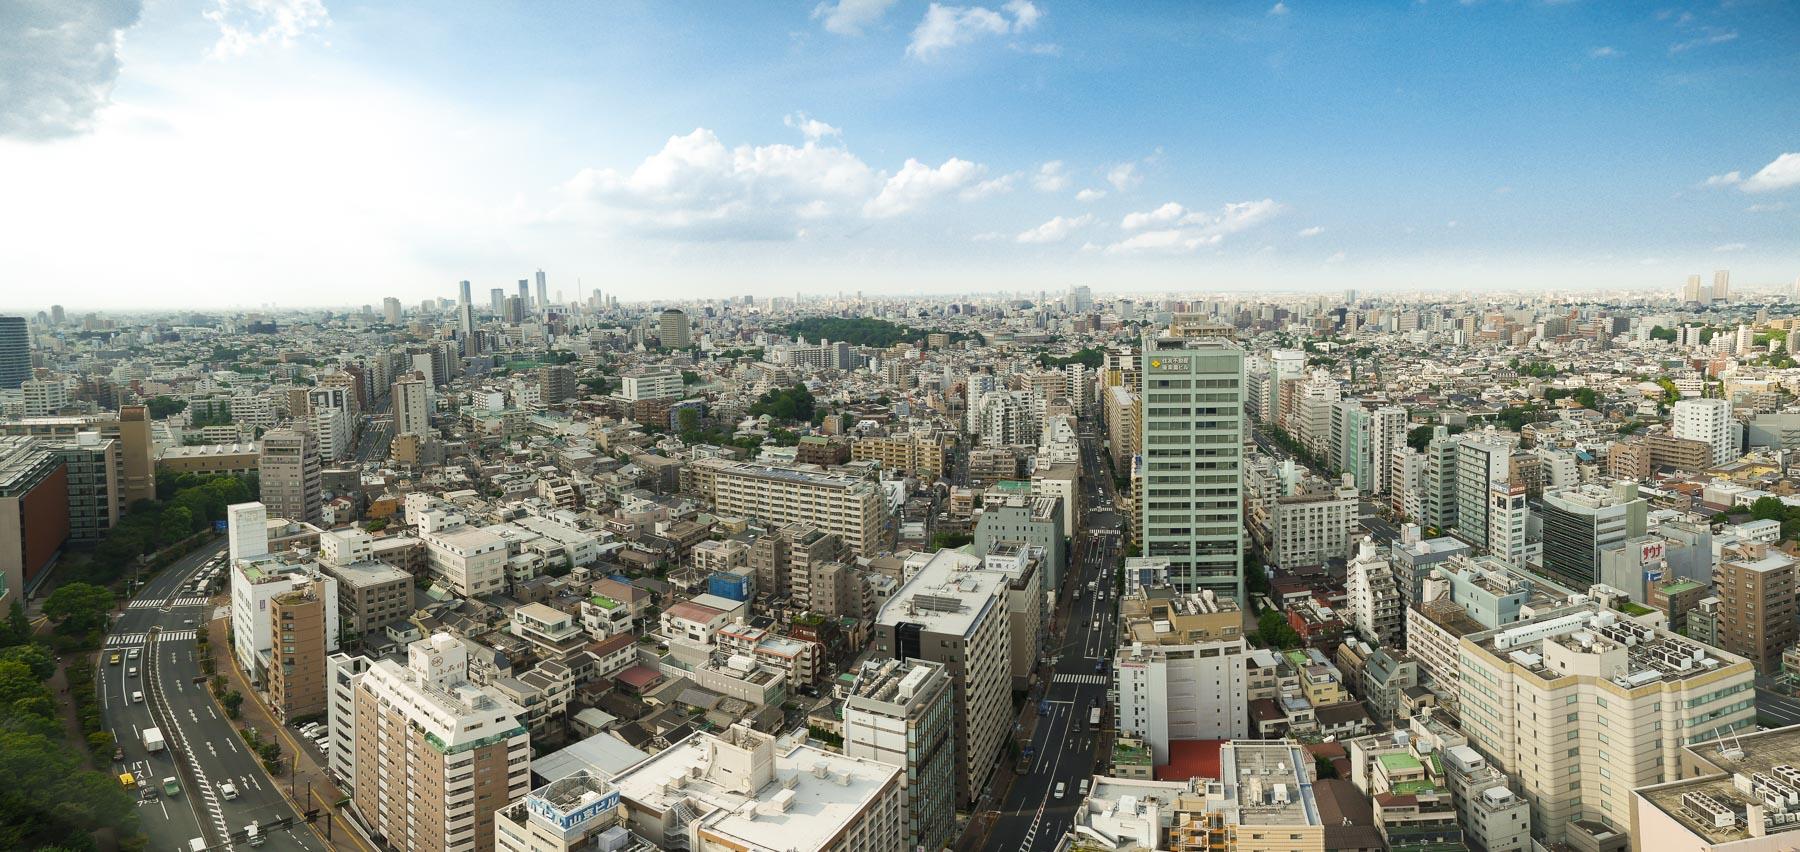 Skyline Tokio mit Blick auf Shinjuku